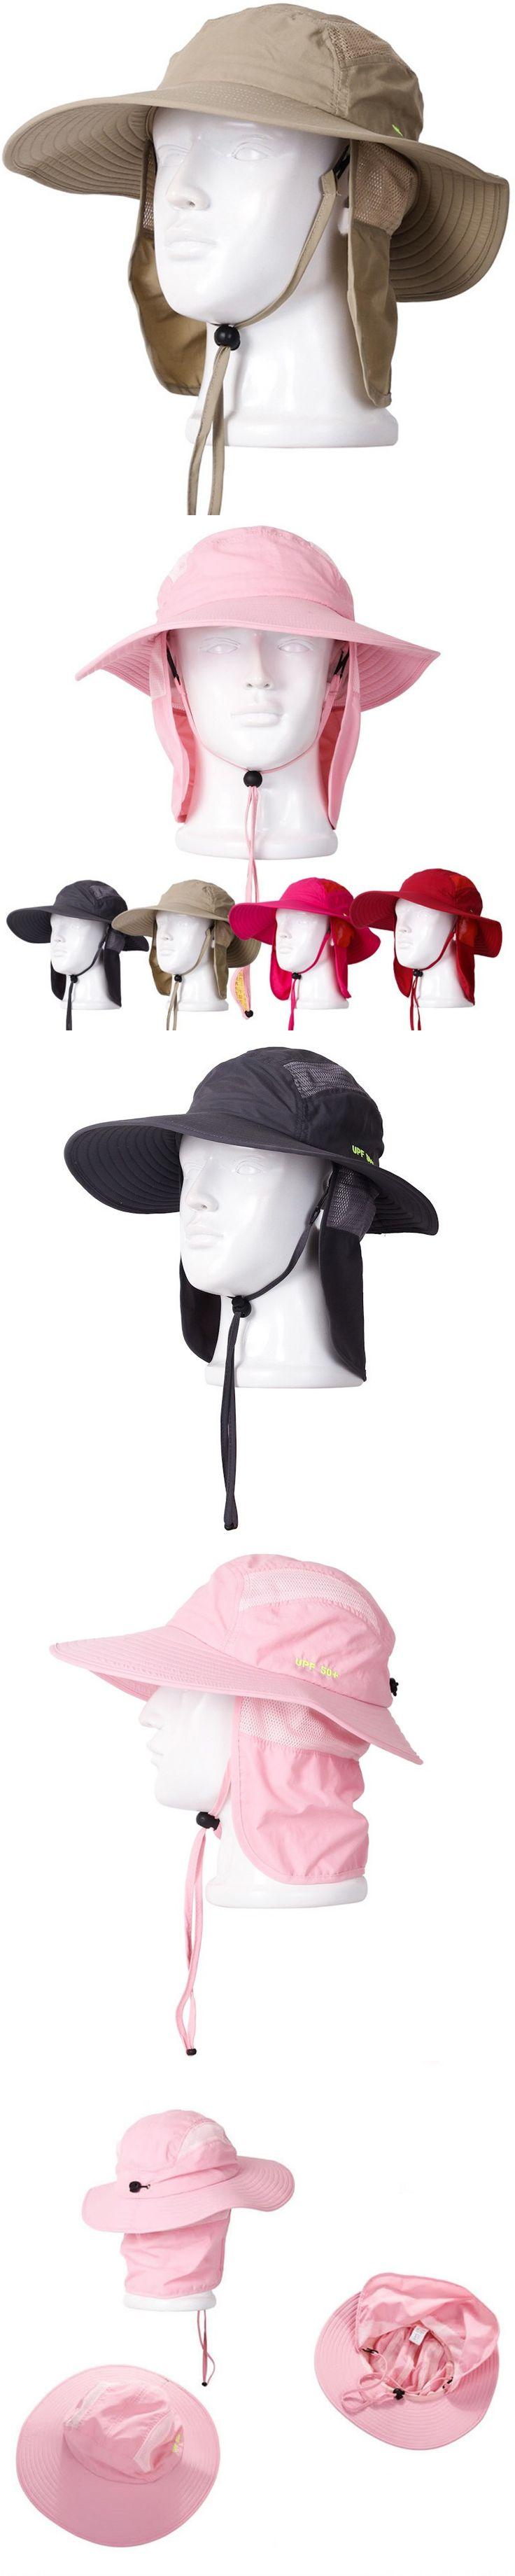 Outdoor Fishing Hiking Farming Quick Dry Sun Shield Hat Cap Men Women Sun Protection Fisherman Bucket Hat With String $15.27